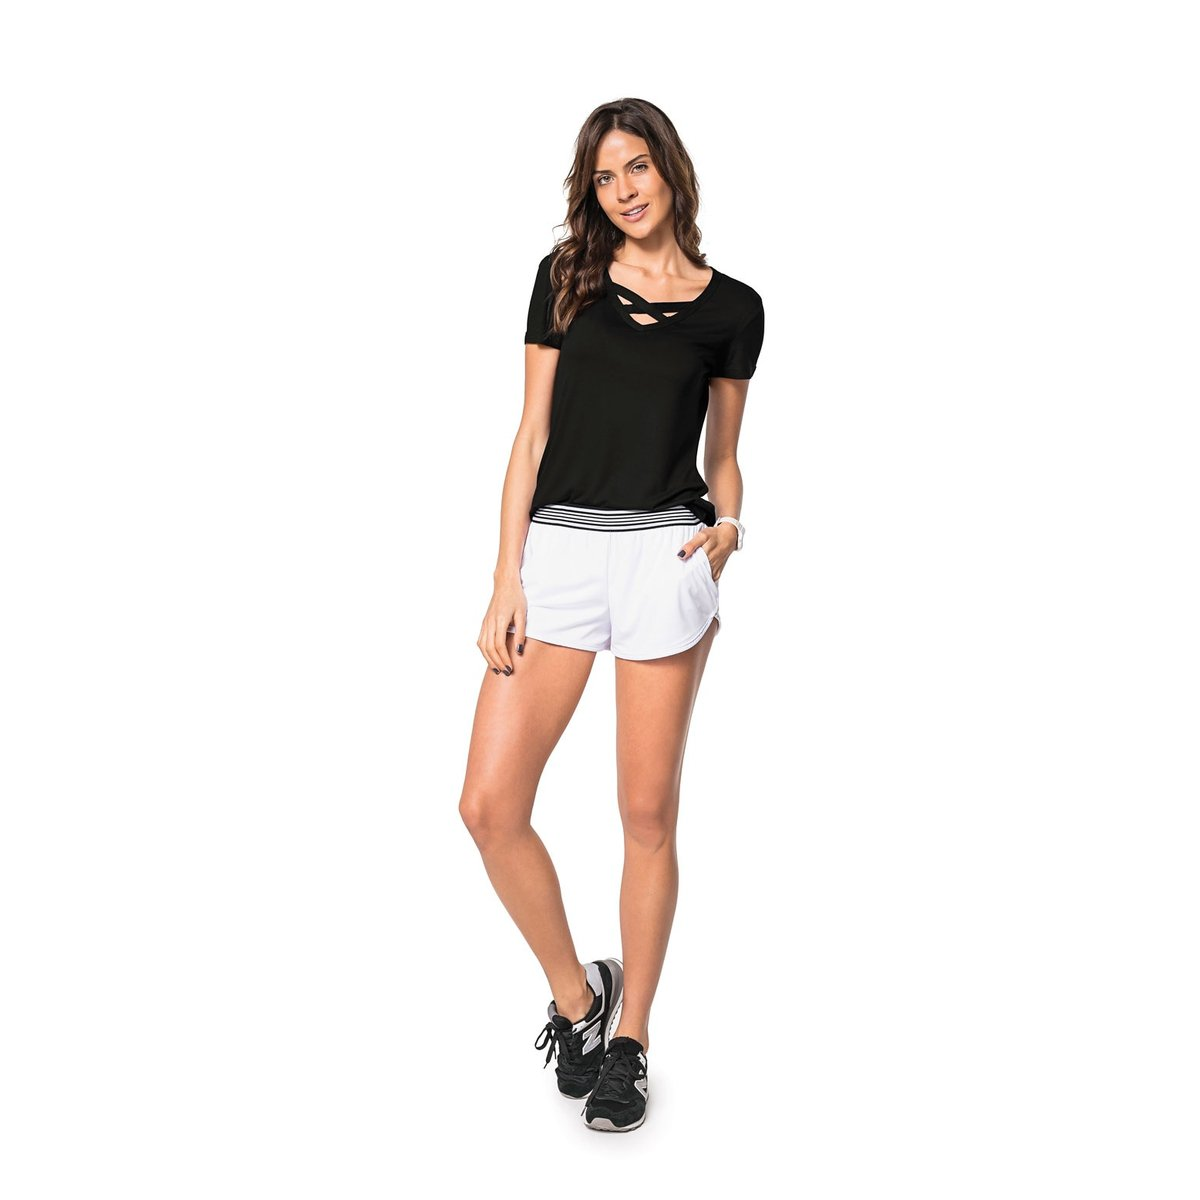 ae61ba4b4ae61d Short Adulto Malwee Liberta - Compre Agora | Netshoes